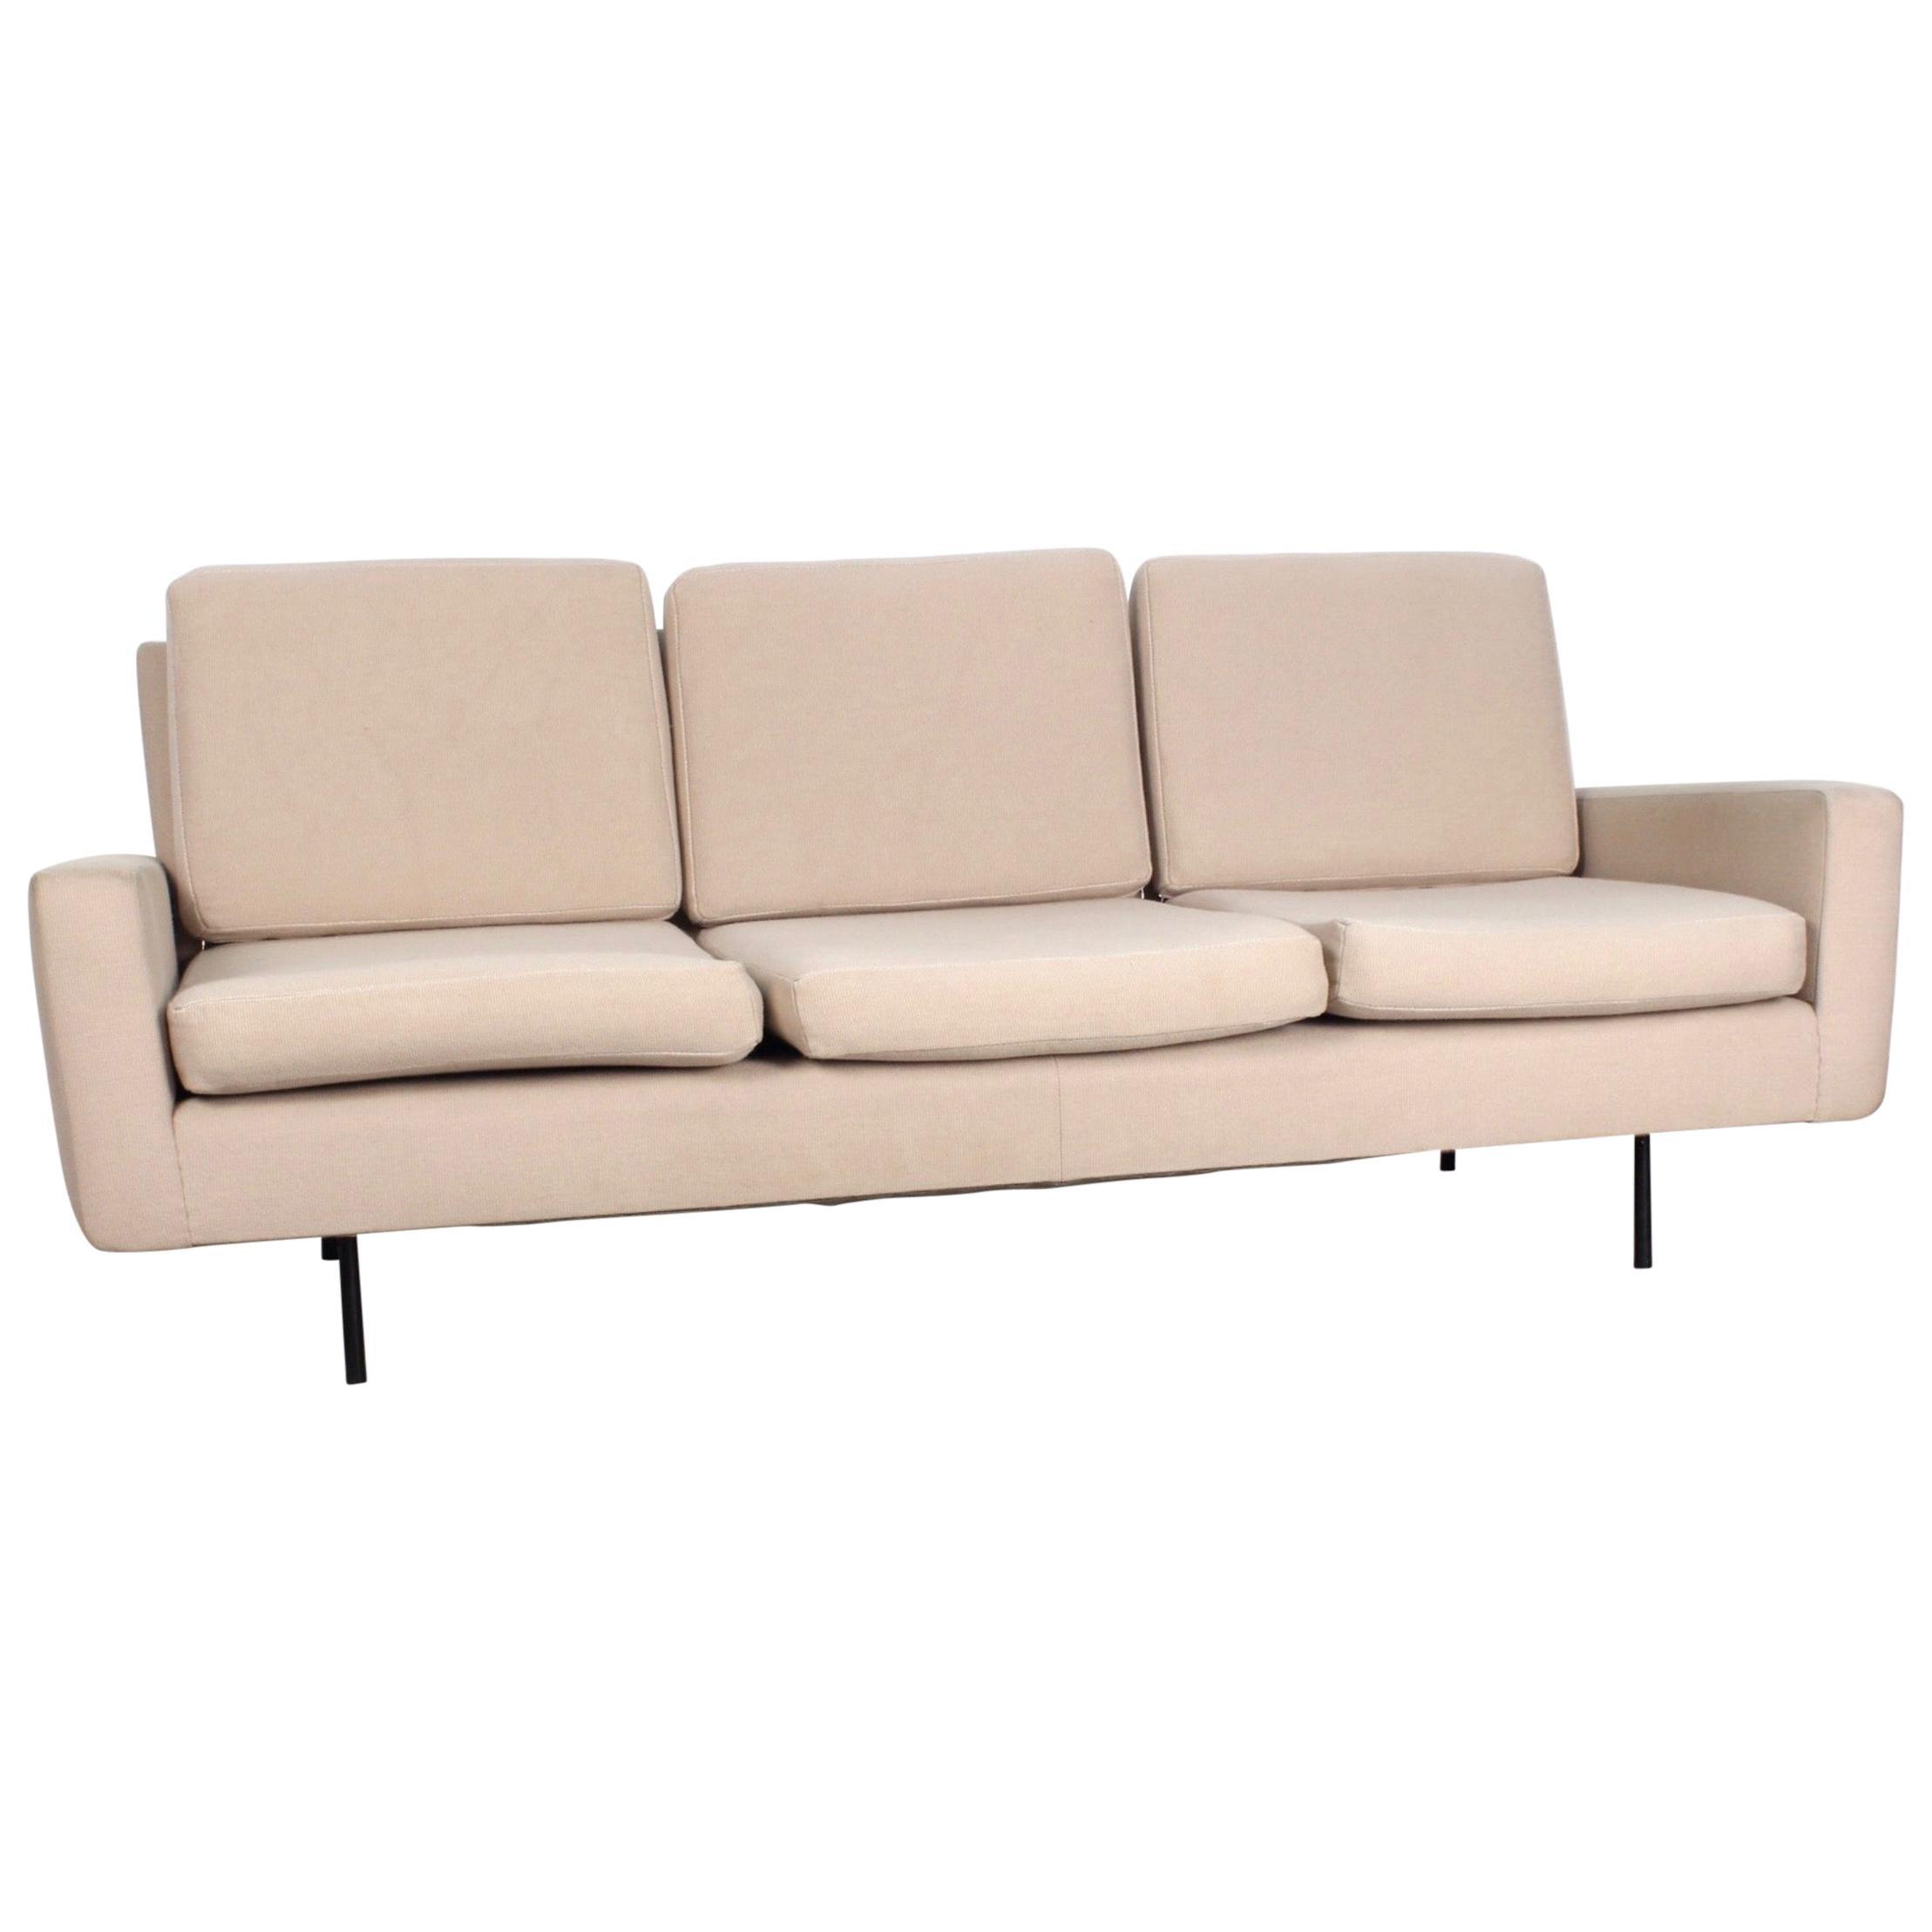 Florence Knoll 3-Seat Sofa